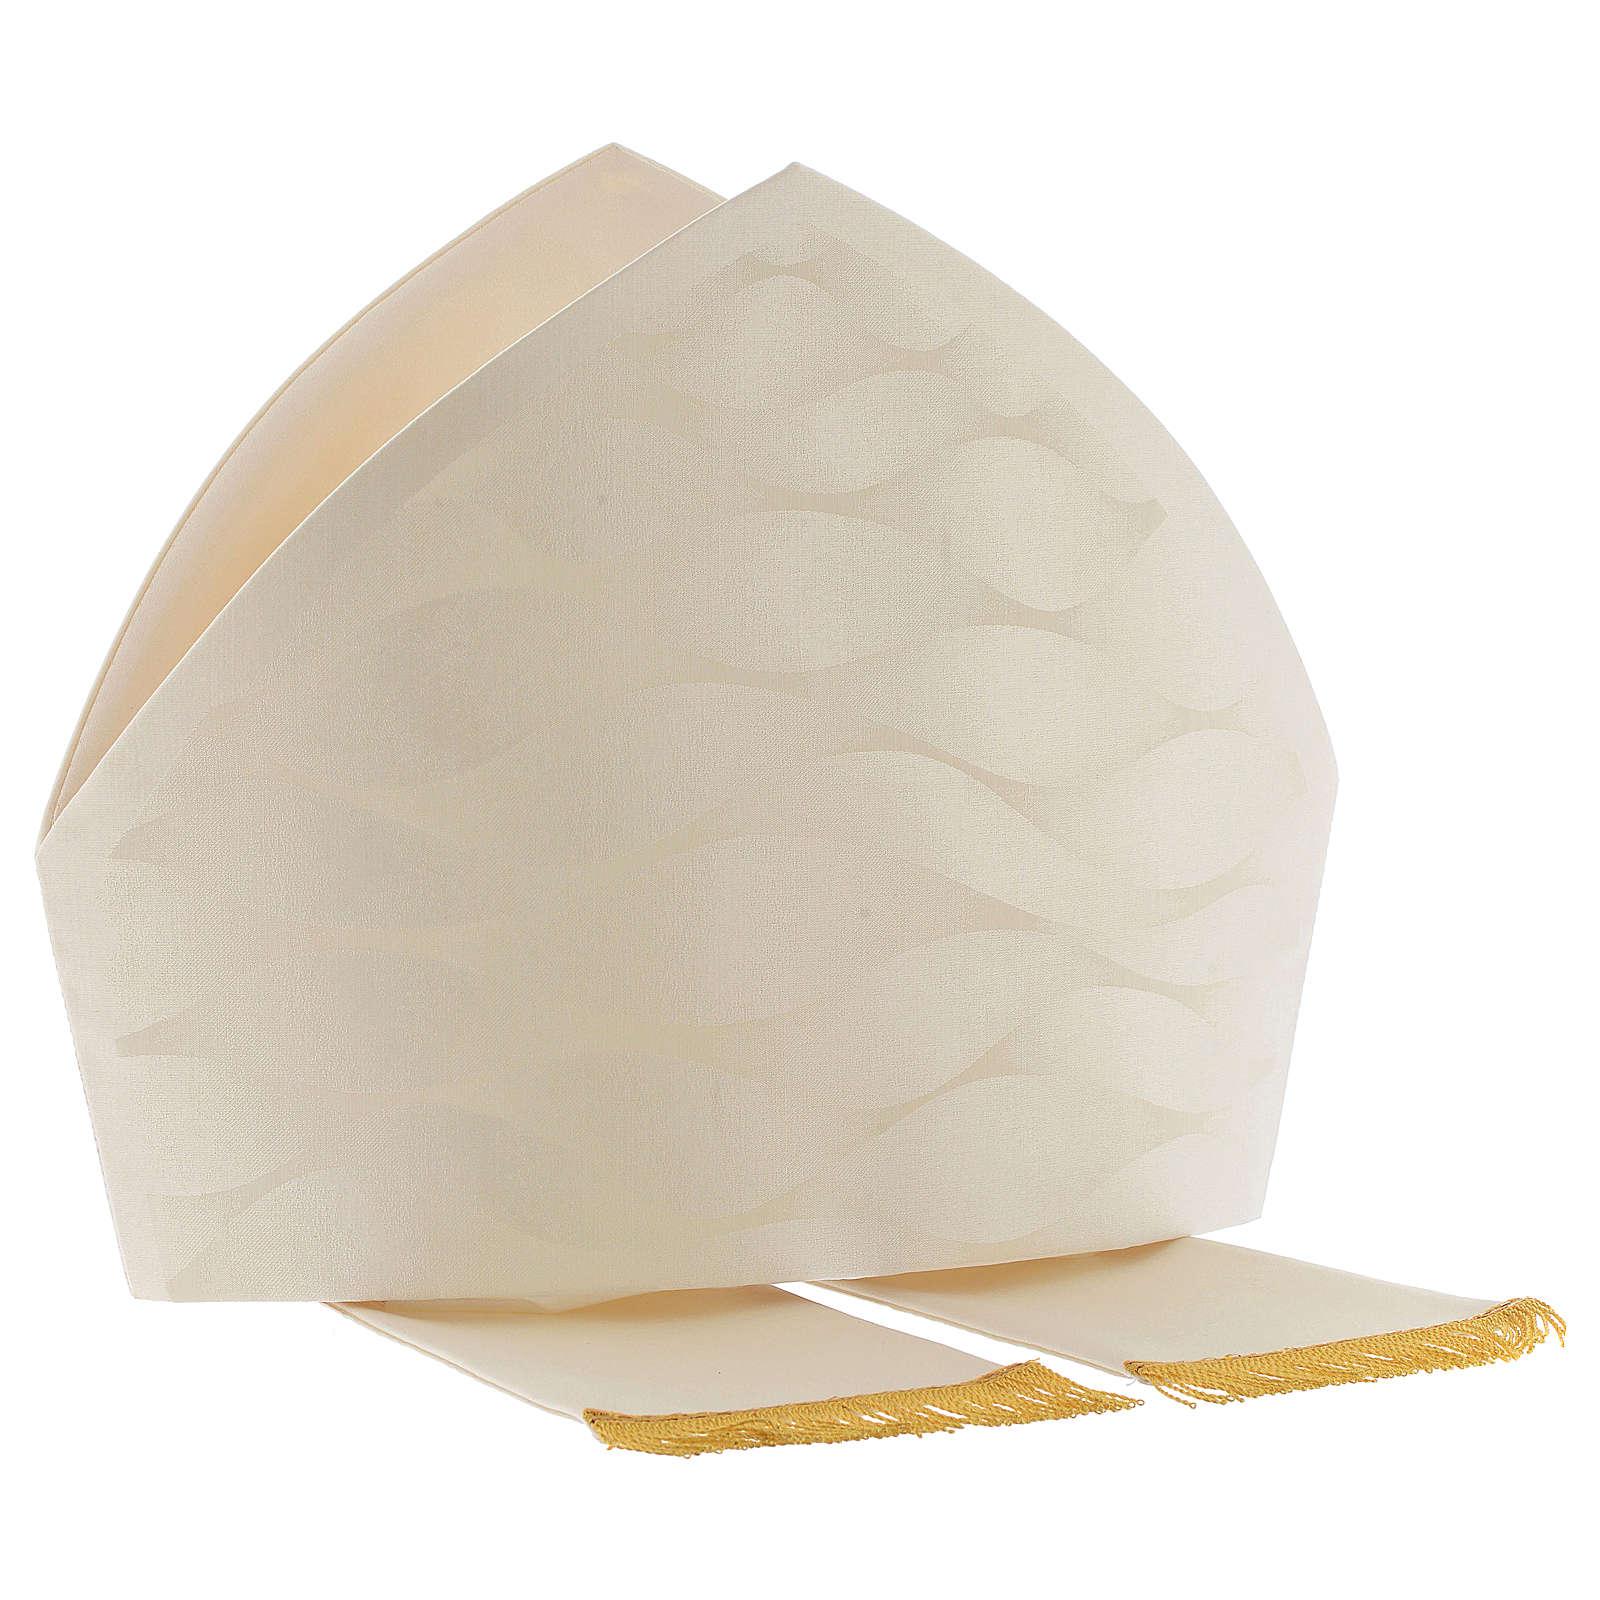 Mitra branca cor de marfim lã seda Jacquard 3